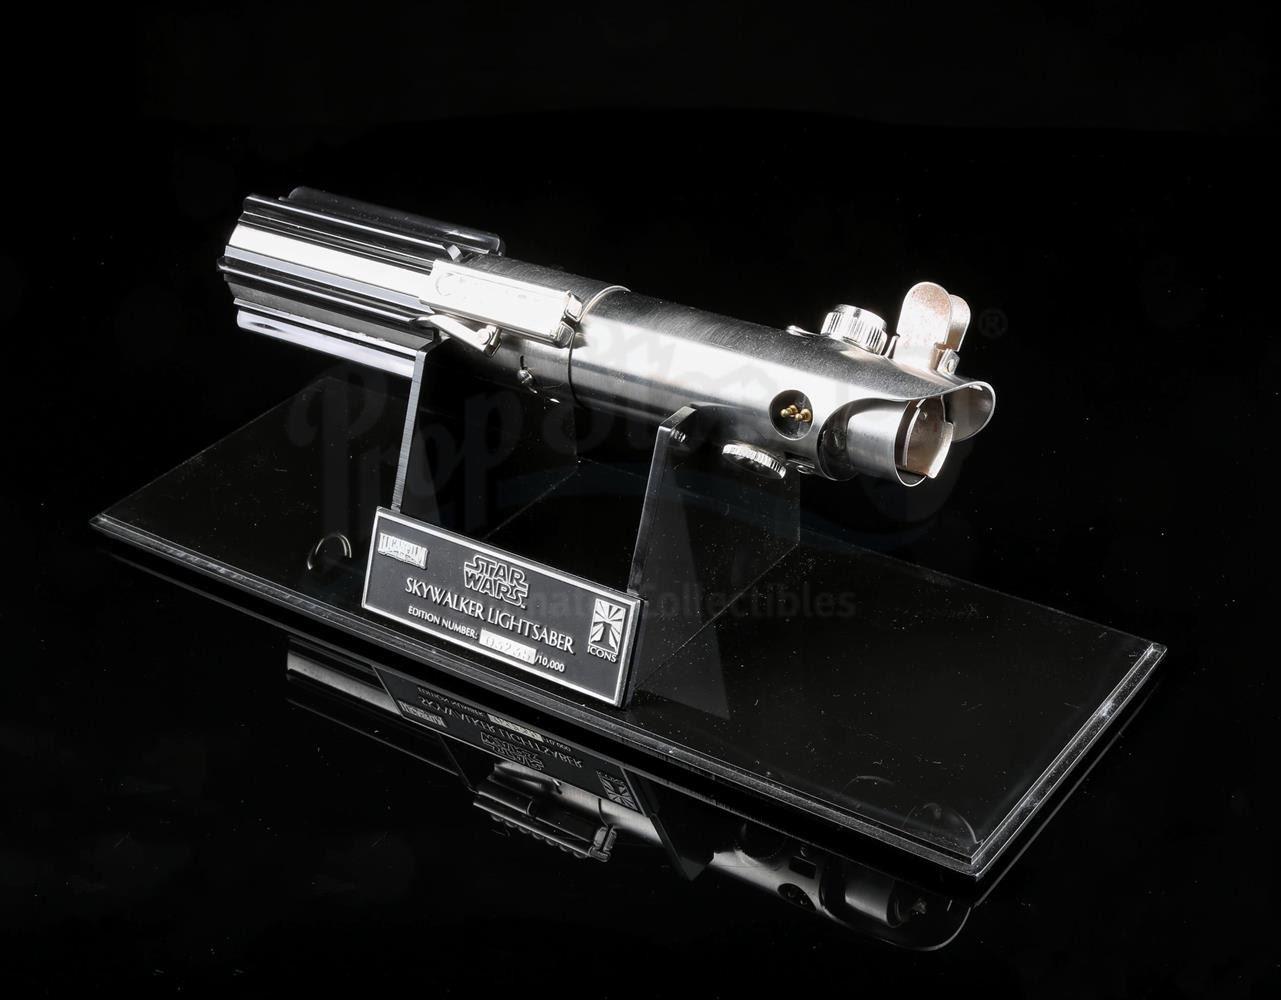 Luke Skywalker Lightsaber Repro Weapon VERY CLOSE Star Wars MP